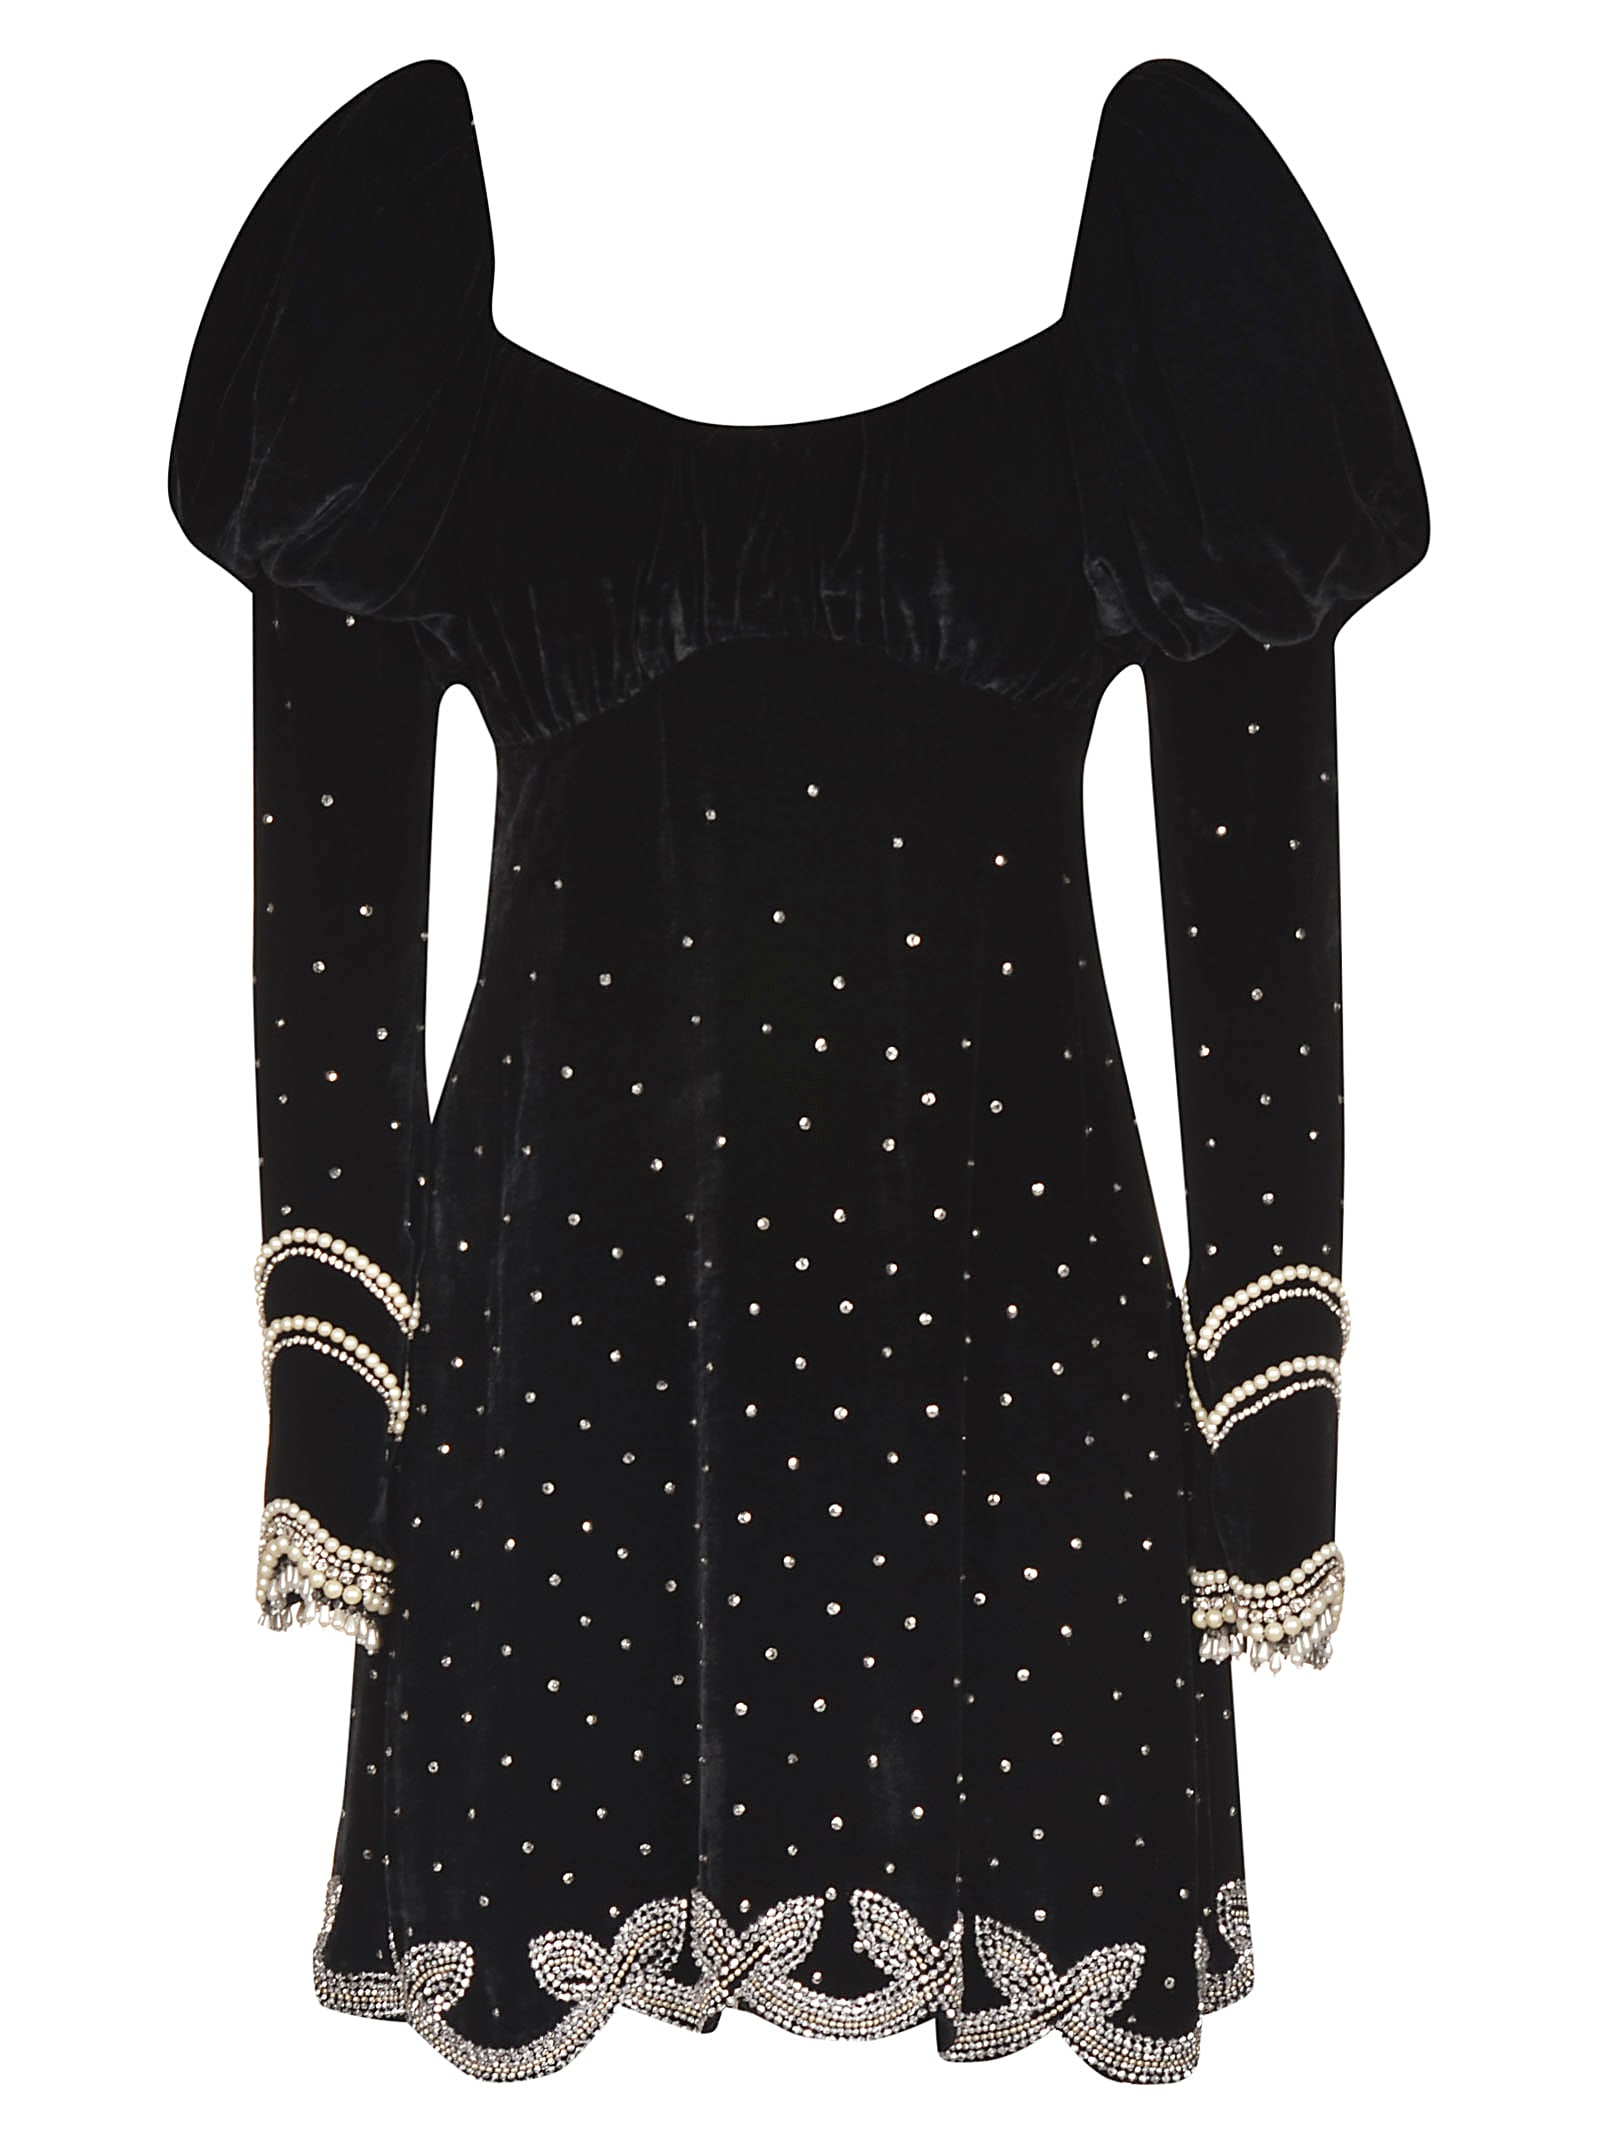 WANDERING Velvet Embellished Dress